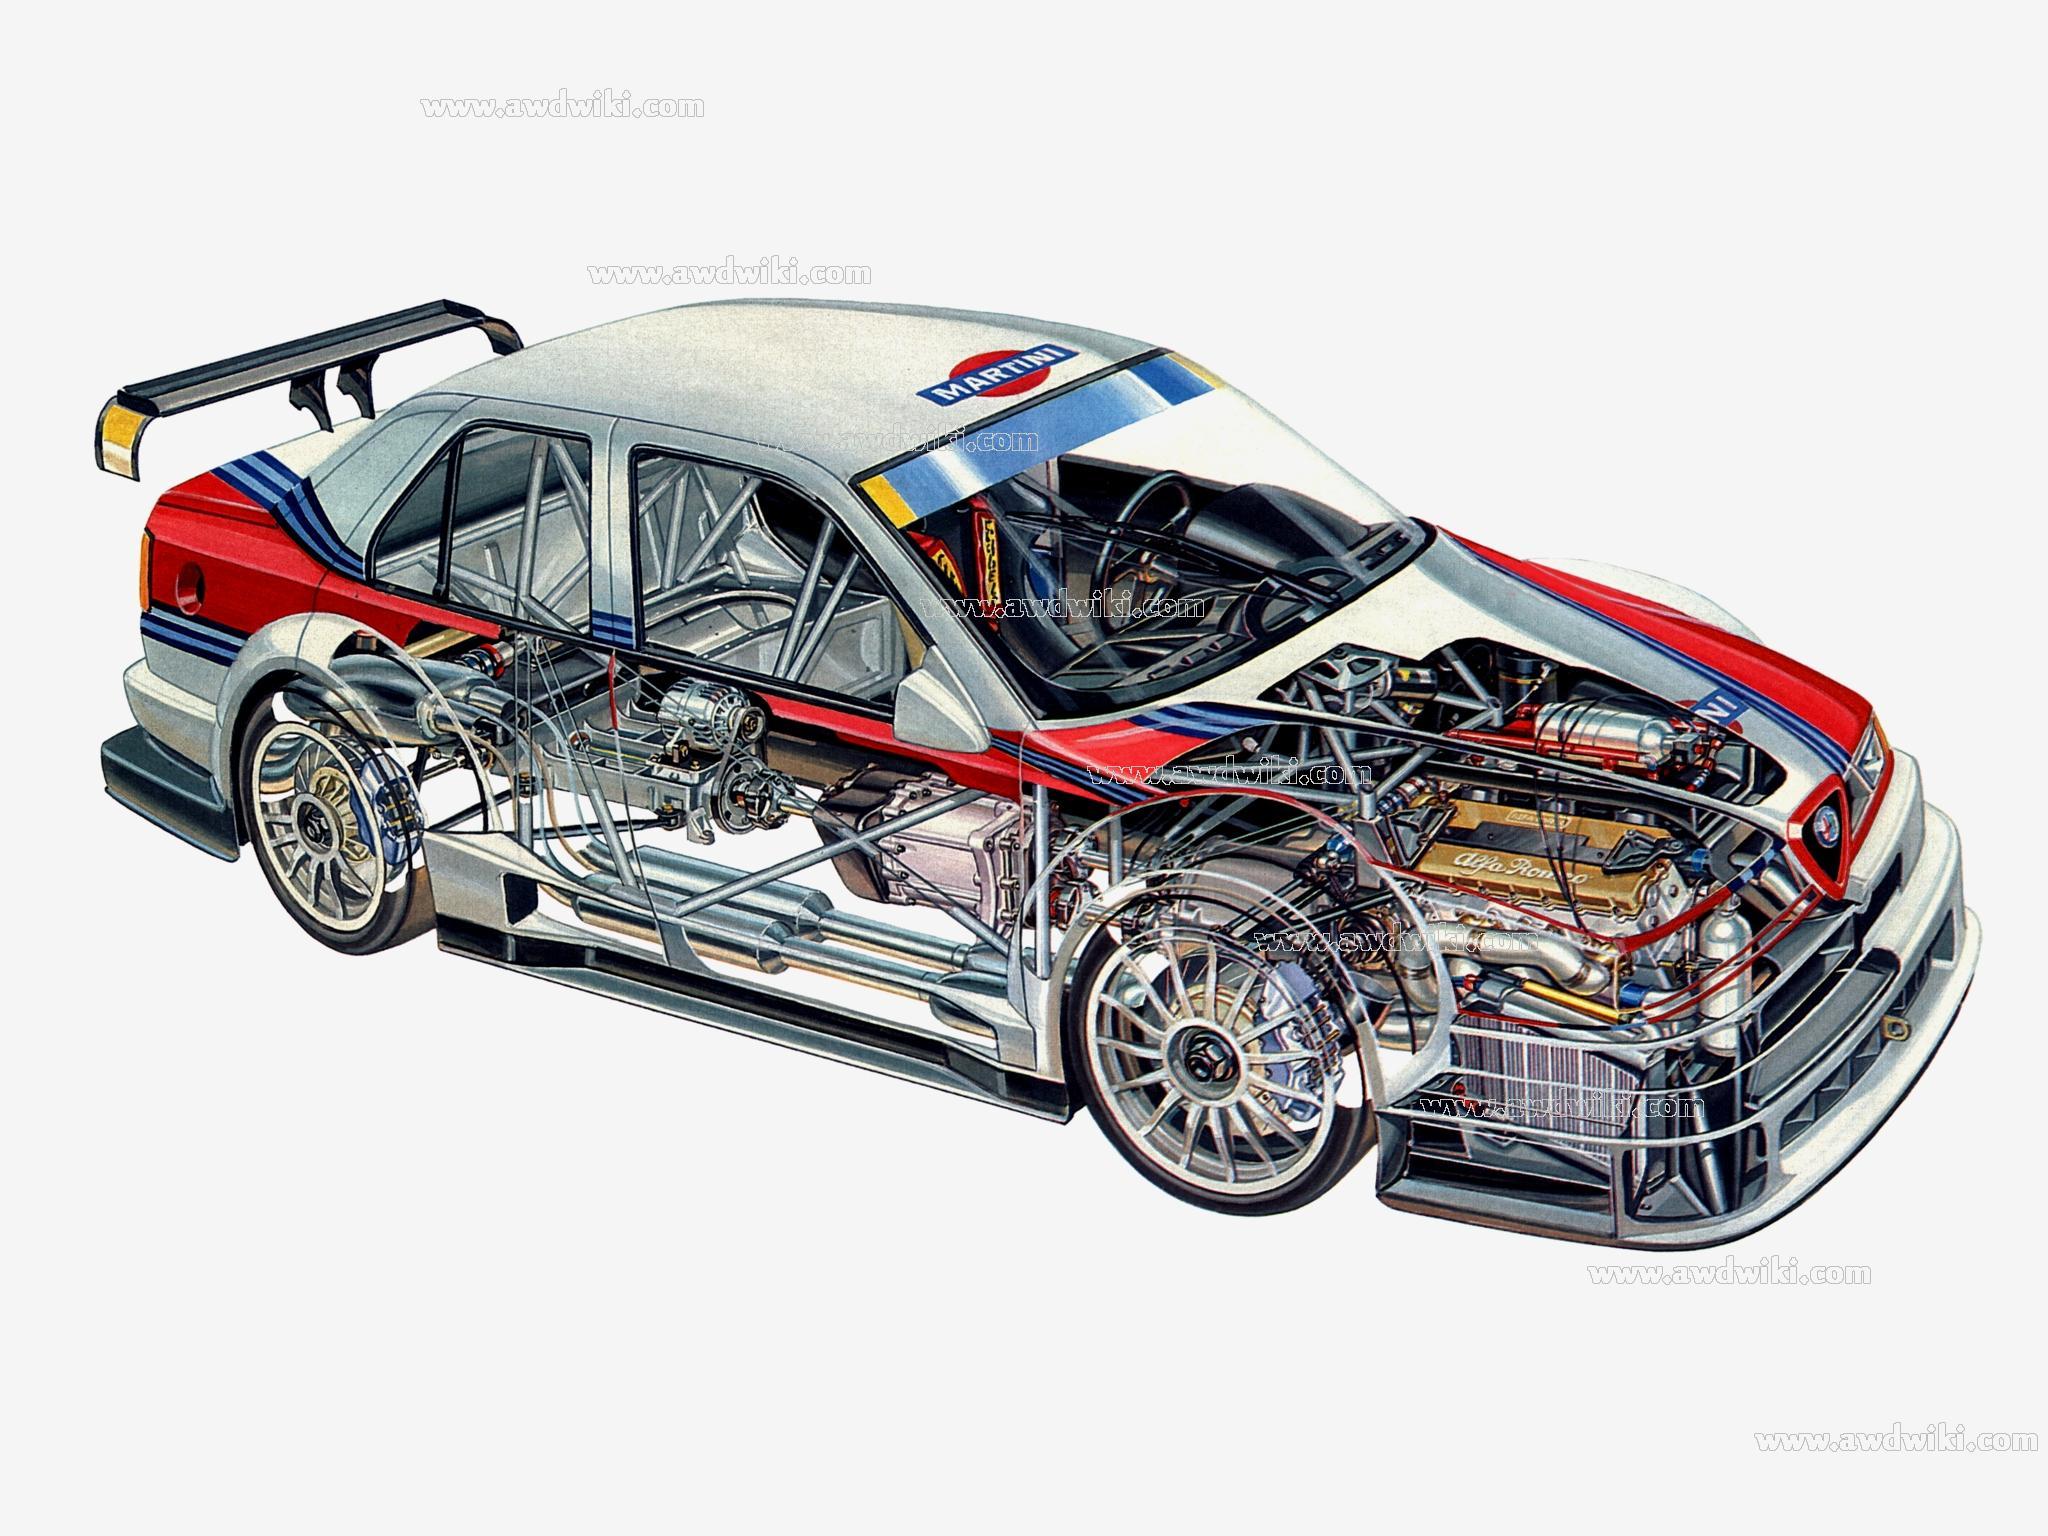 alfa romeo all wheel drive explained awd cars x vehicles wd alfa romeo 155 dtm 3